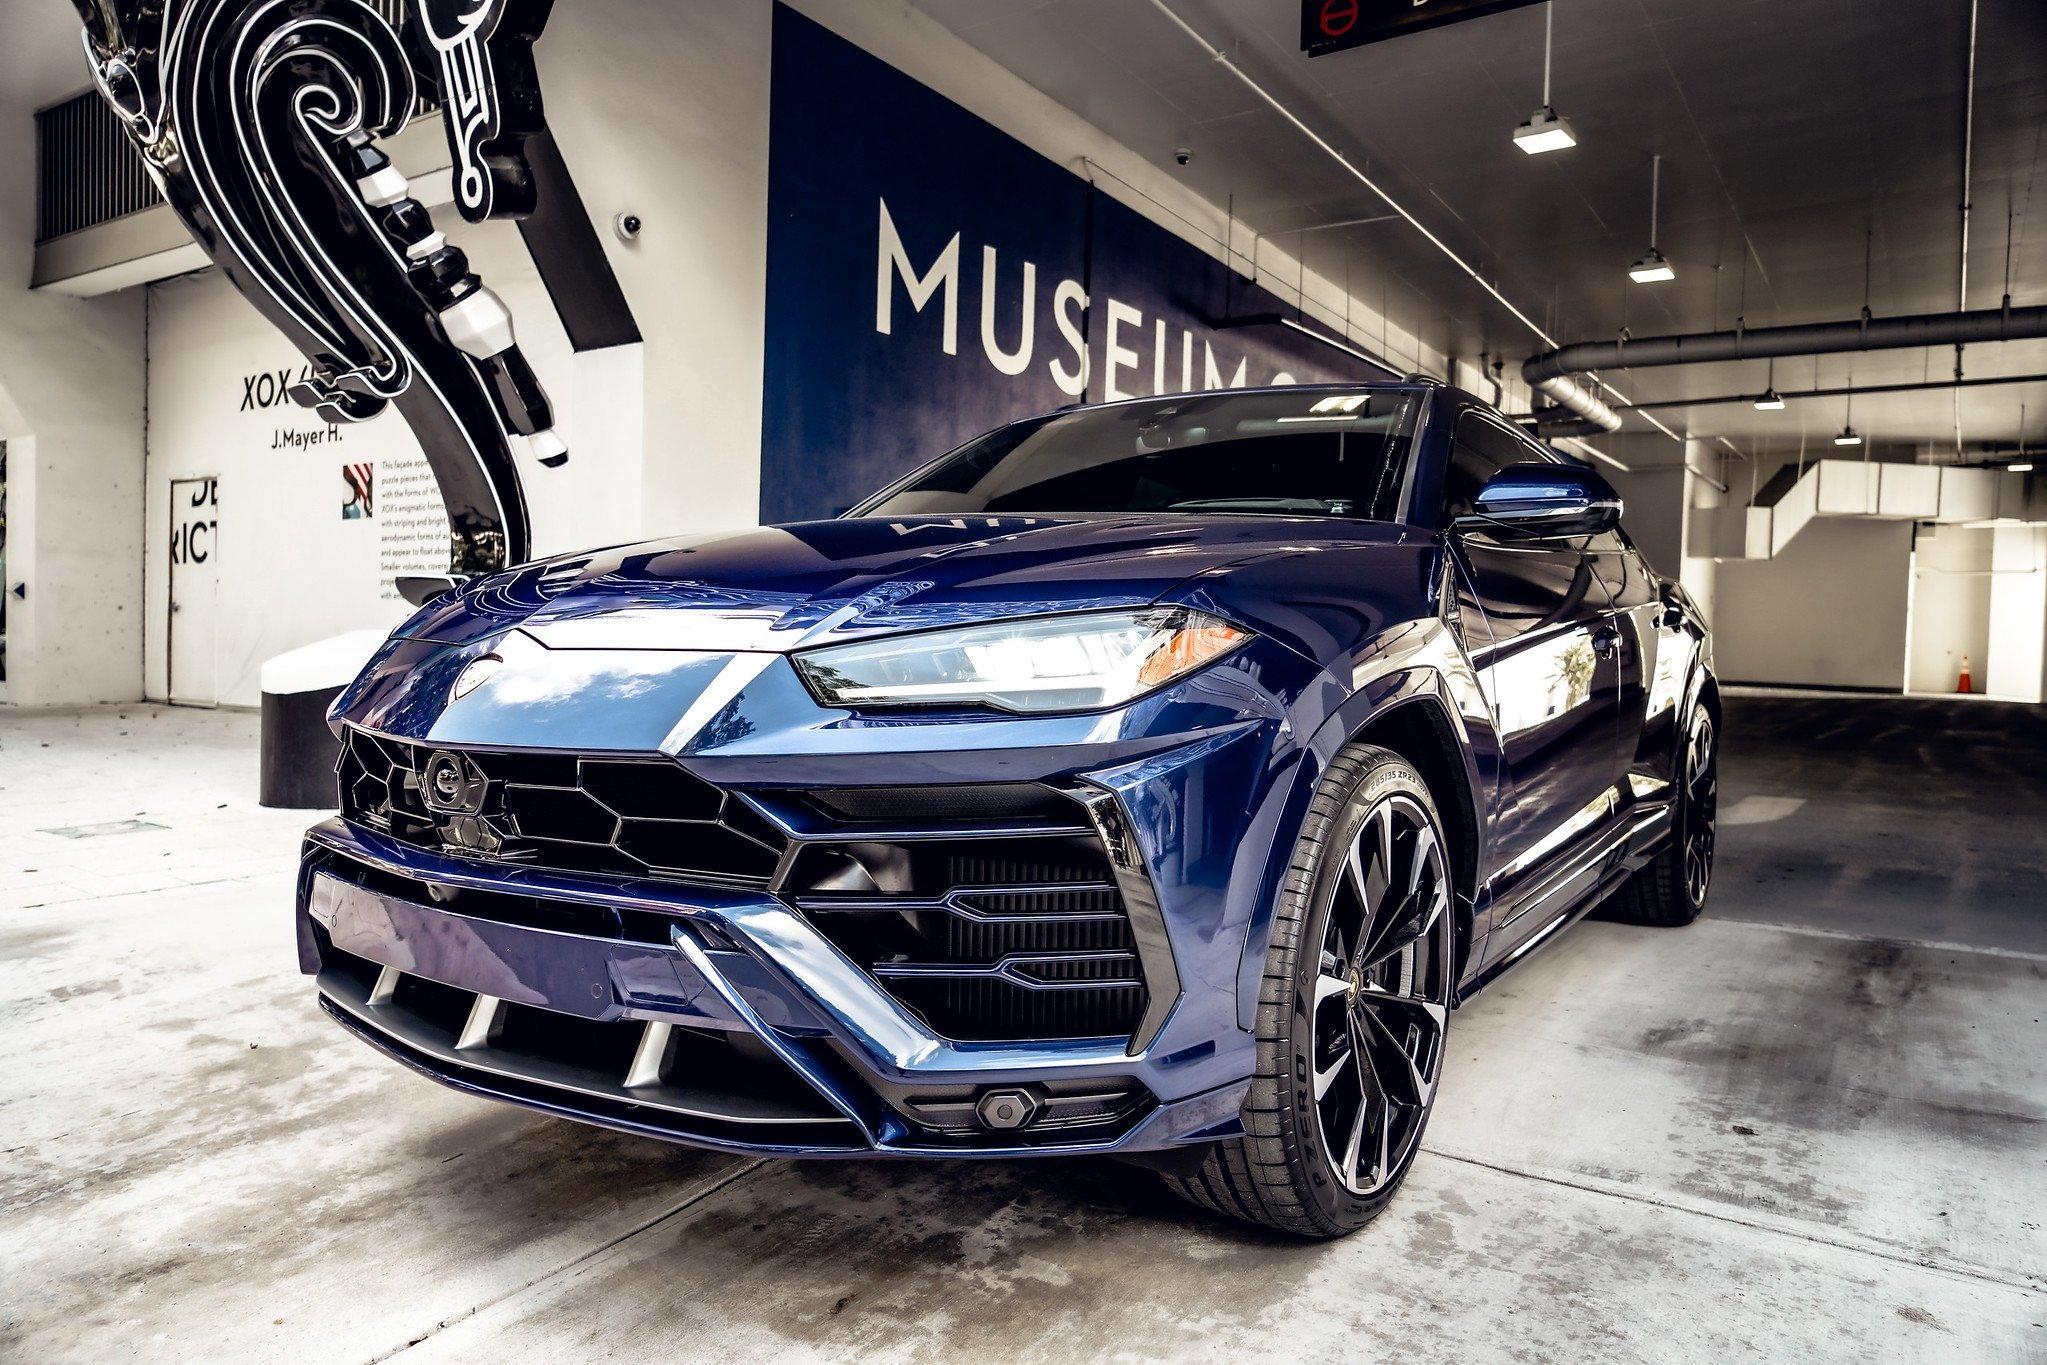 Image #13 of our  2021 Lamborghini Urus - Dark Blue    In Miami Fort Lauderdale Palm Beach South Florida